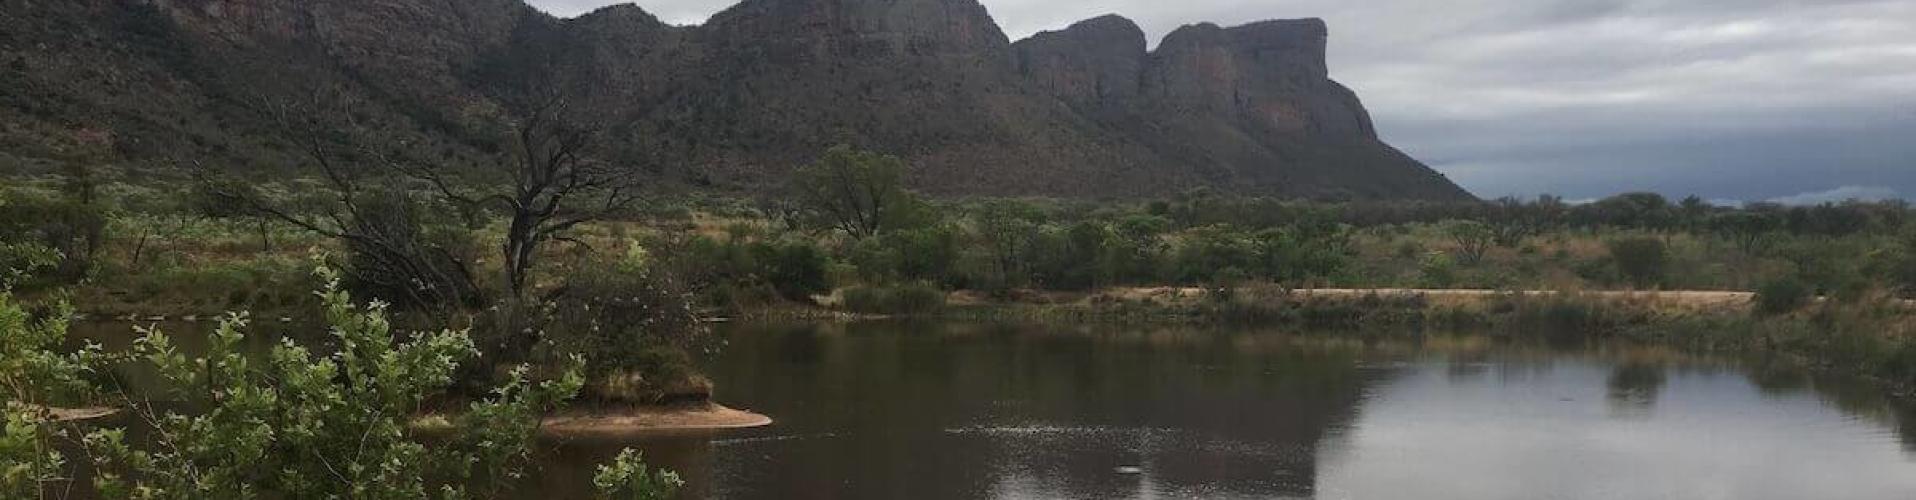 entabeni zuid afrika game reserve